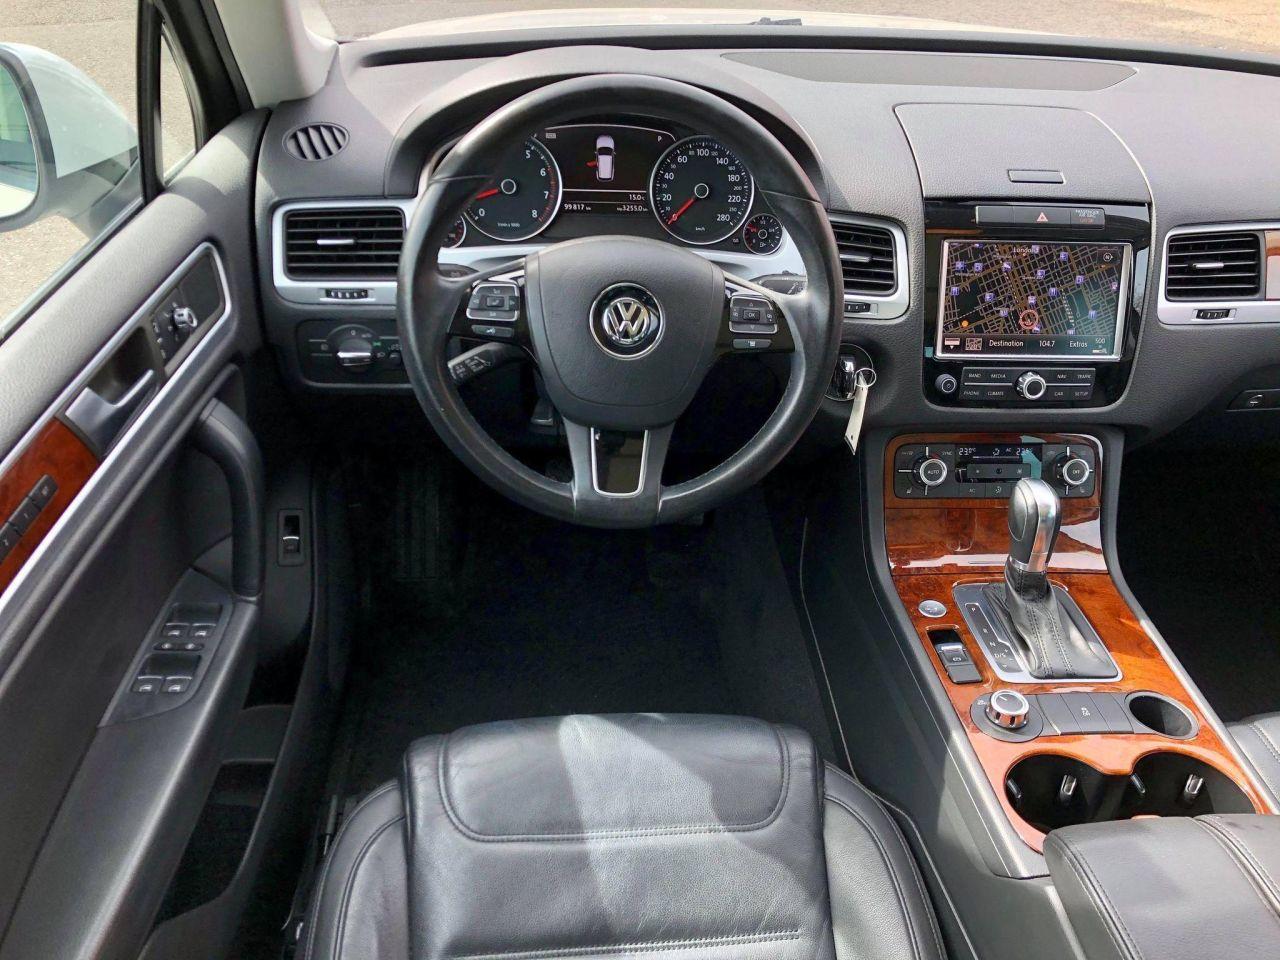 2013 Volkswagen Touareg